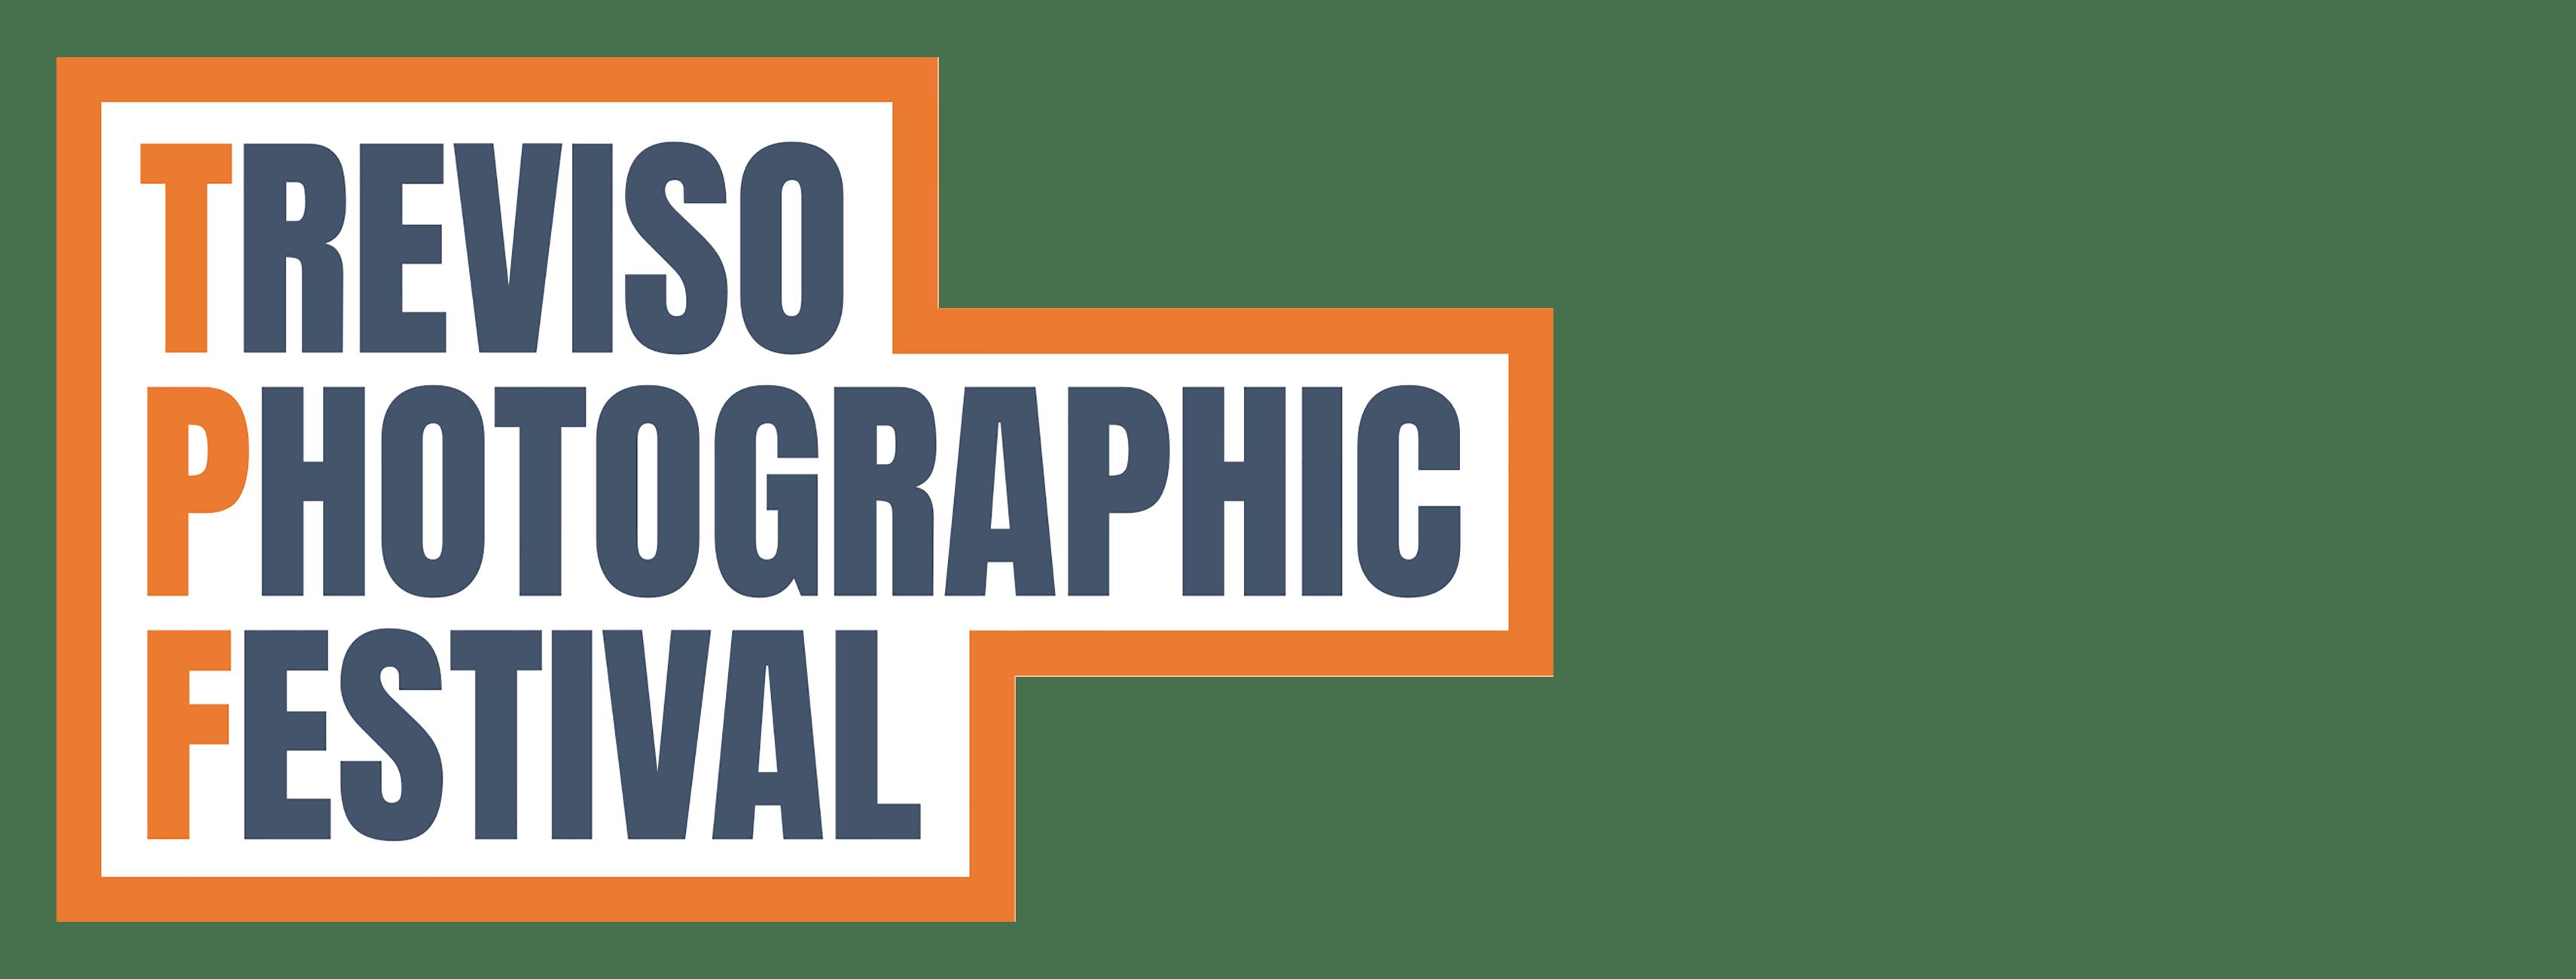 treviso photographic festival